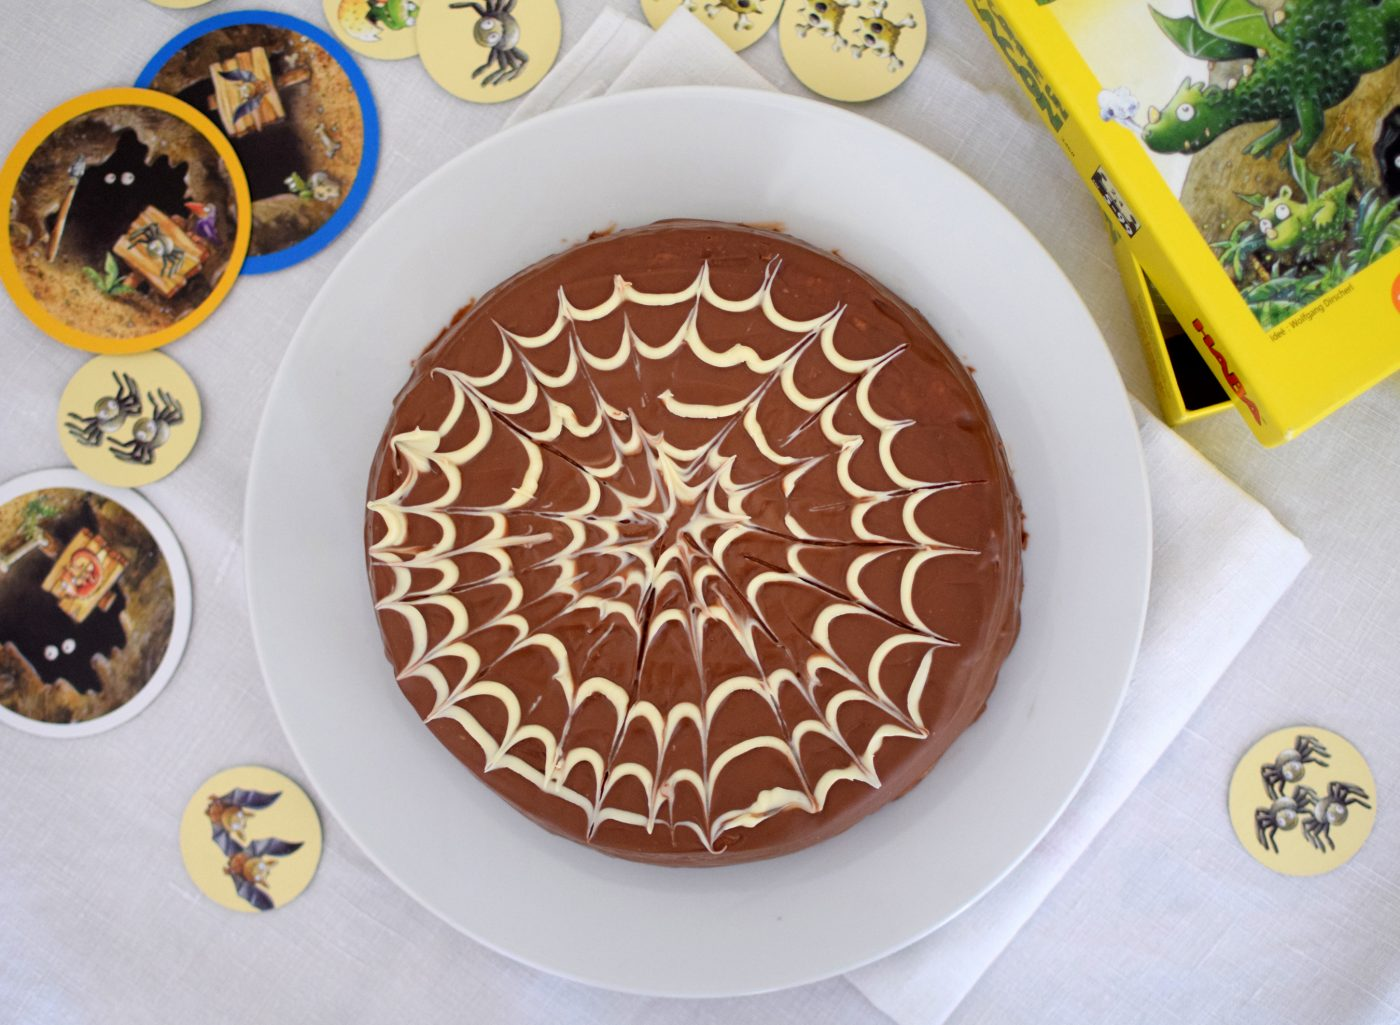 Gâteau choco araignée pour Halloween !